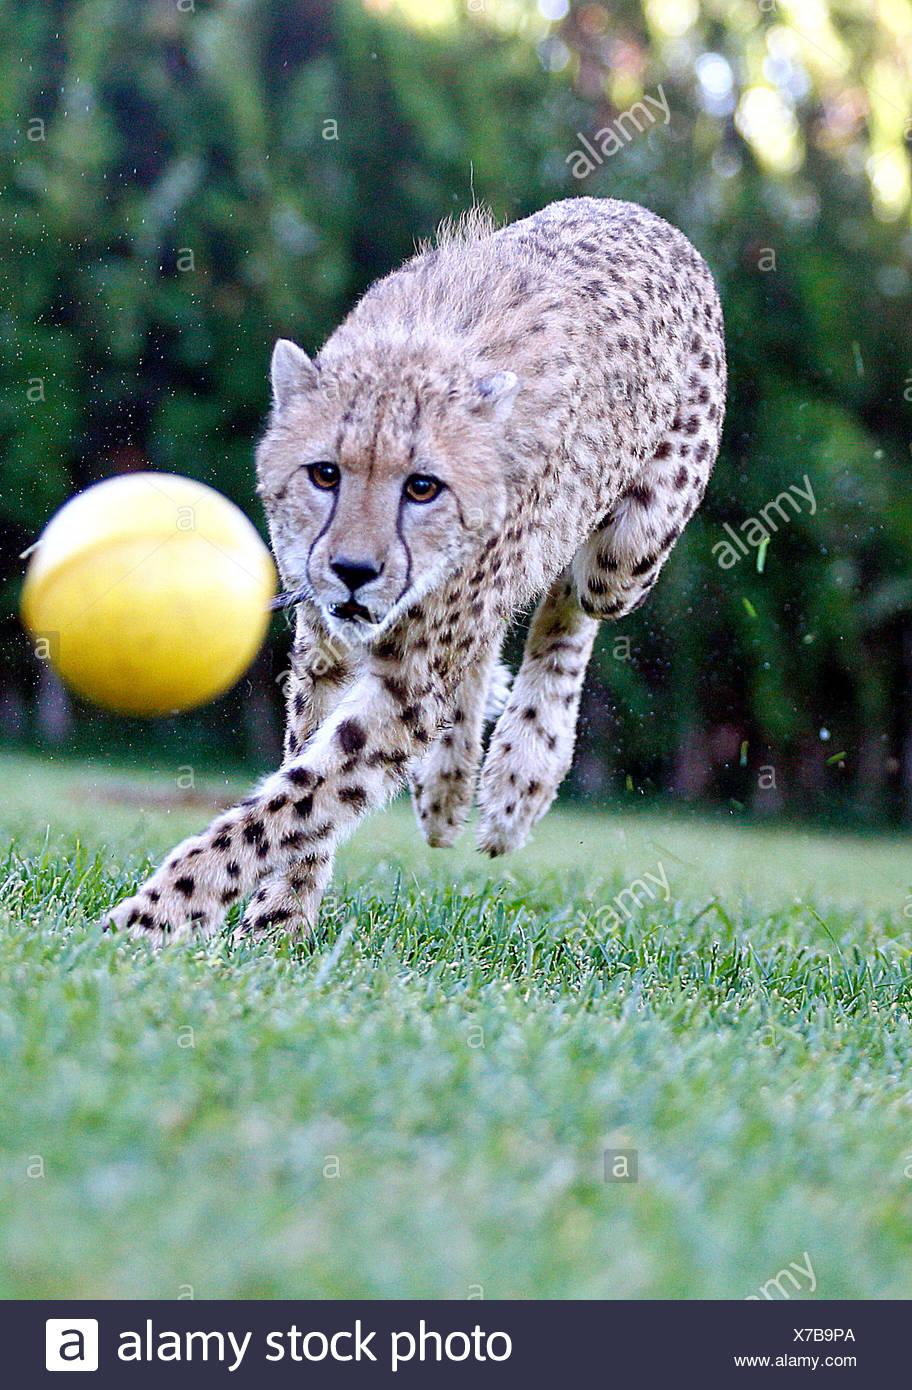 La Barca de la Florida, Spain, cheetah on a farm in Spain - Stock Image